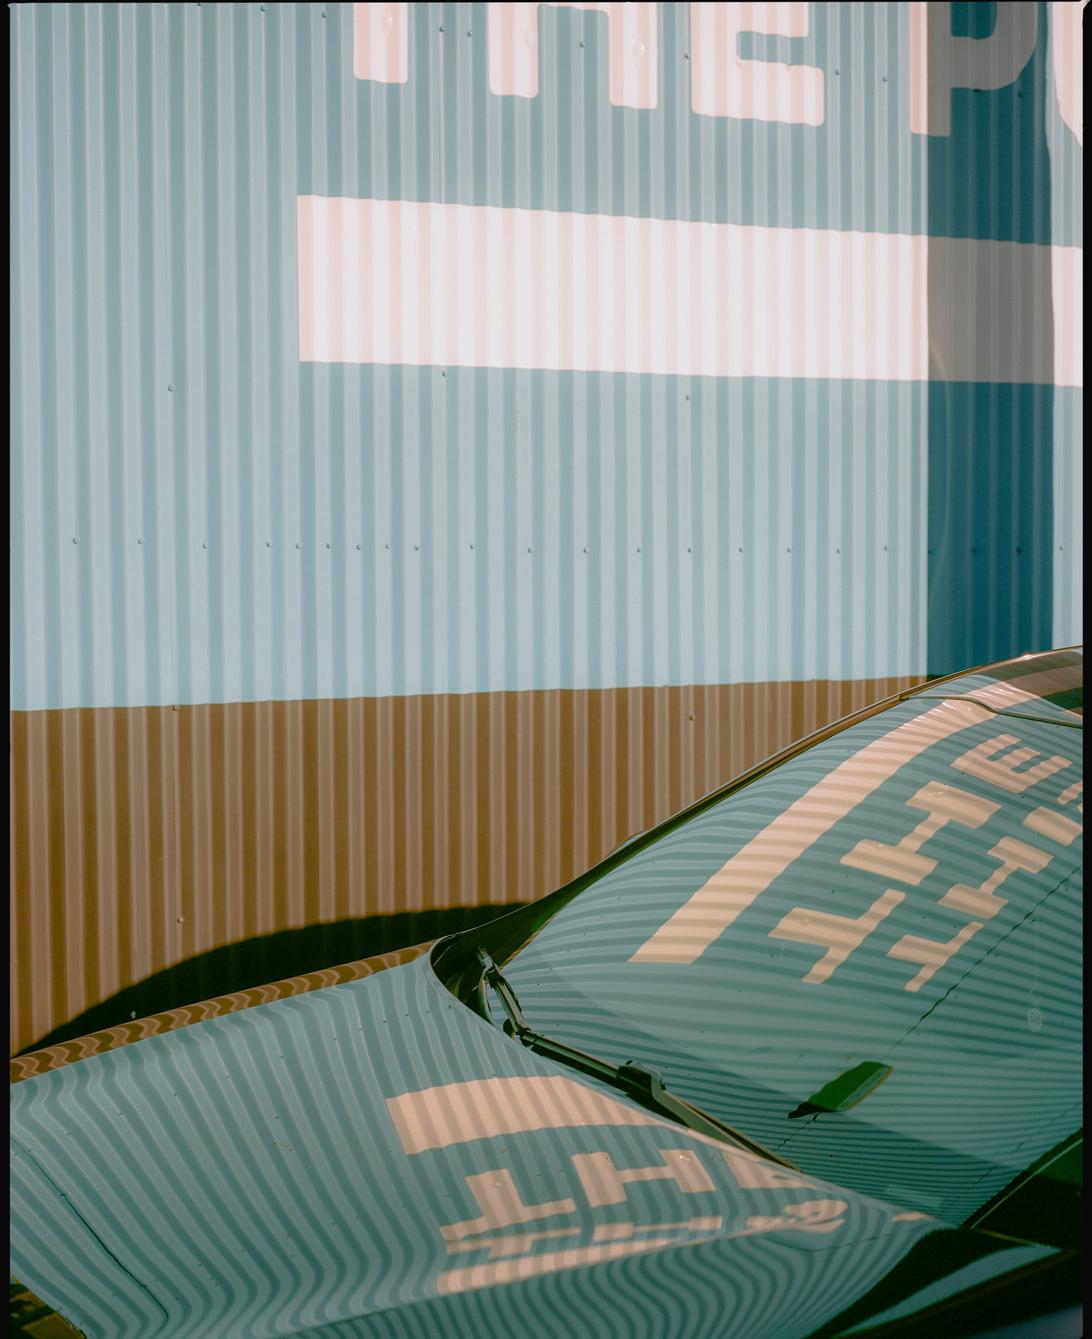 Car_Reflection_Golden_Road.jpg